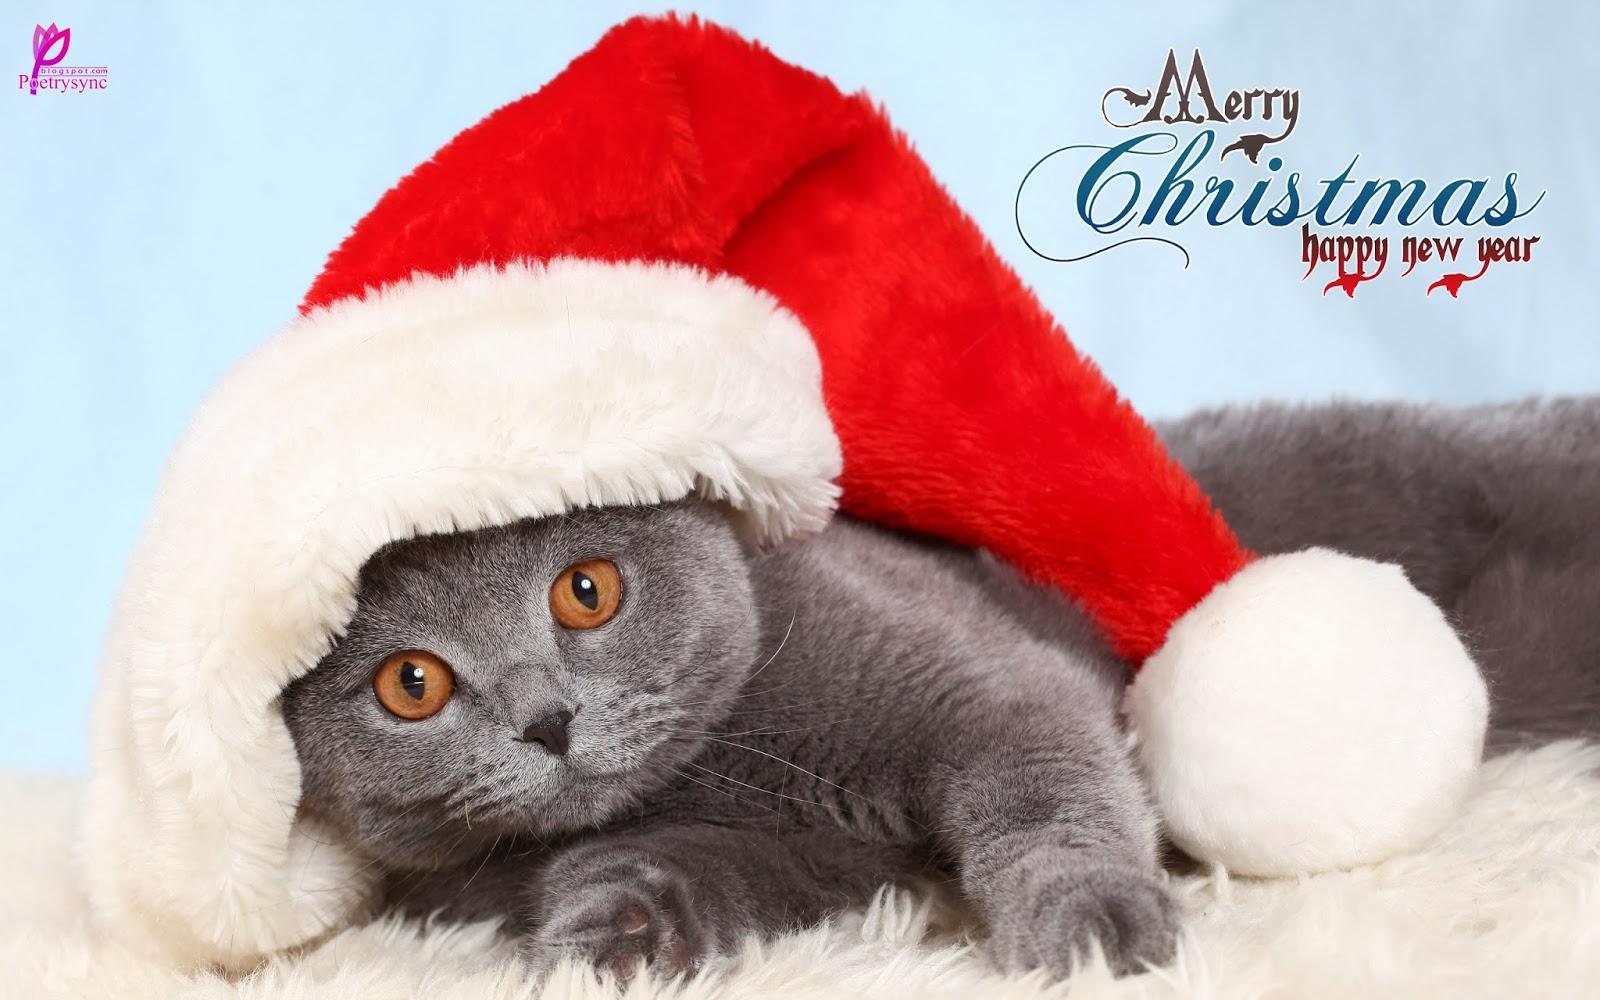 47+ Cute Merry Christmas Wallpaper on WallpaperSafari